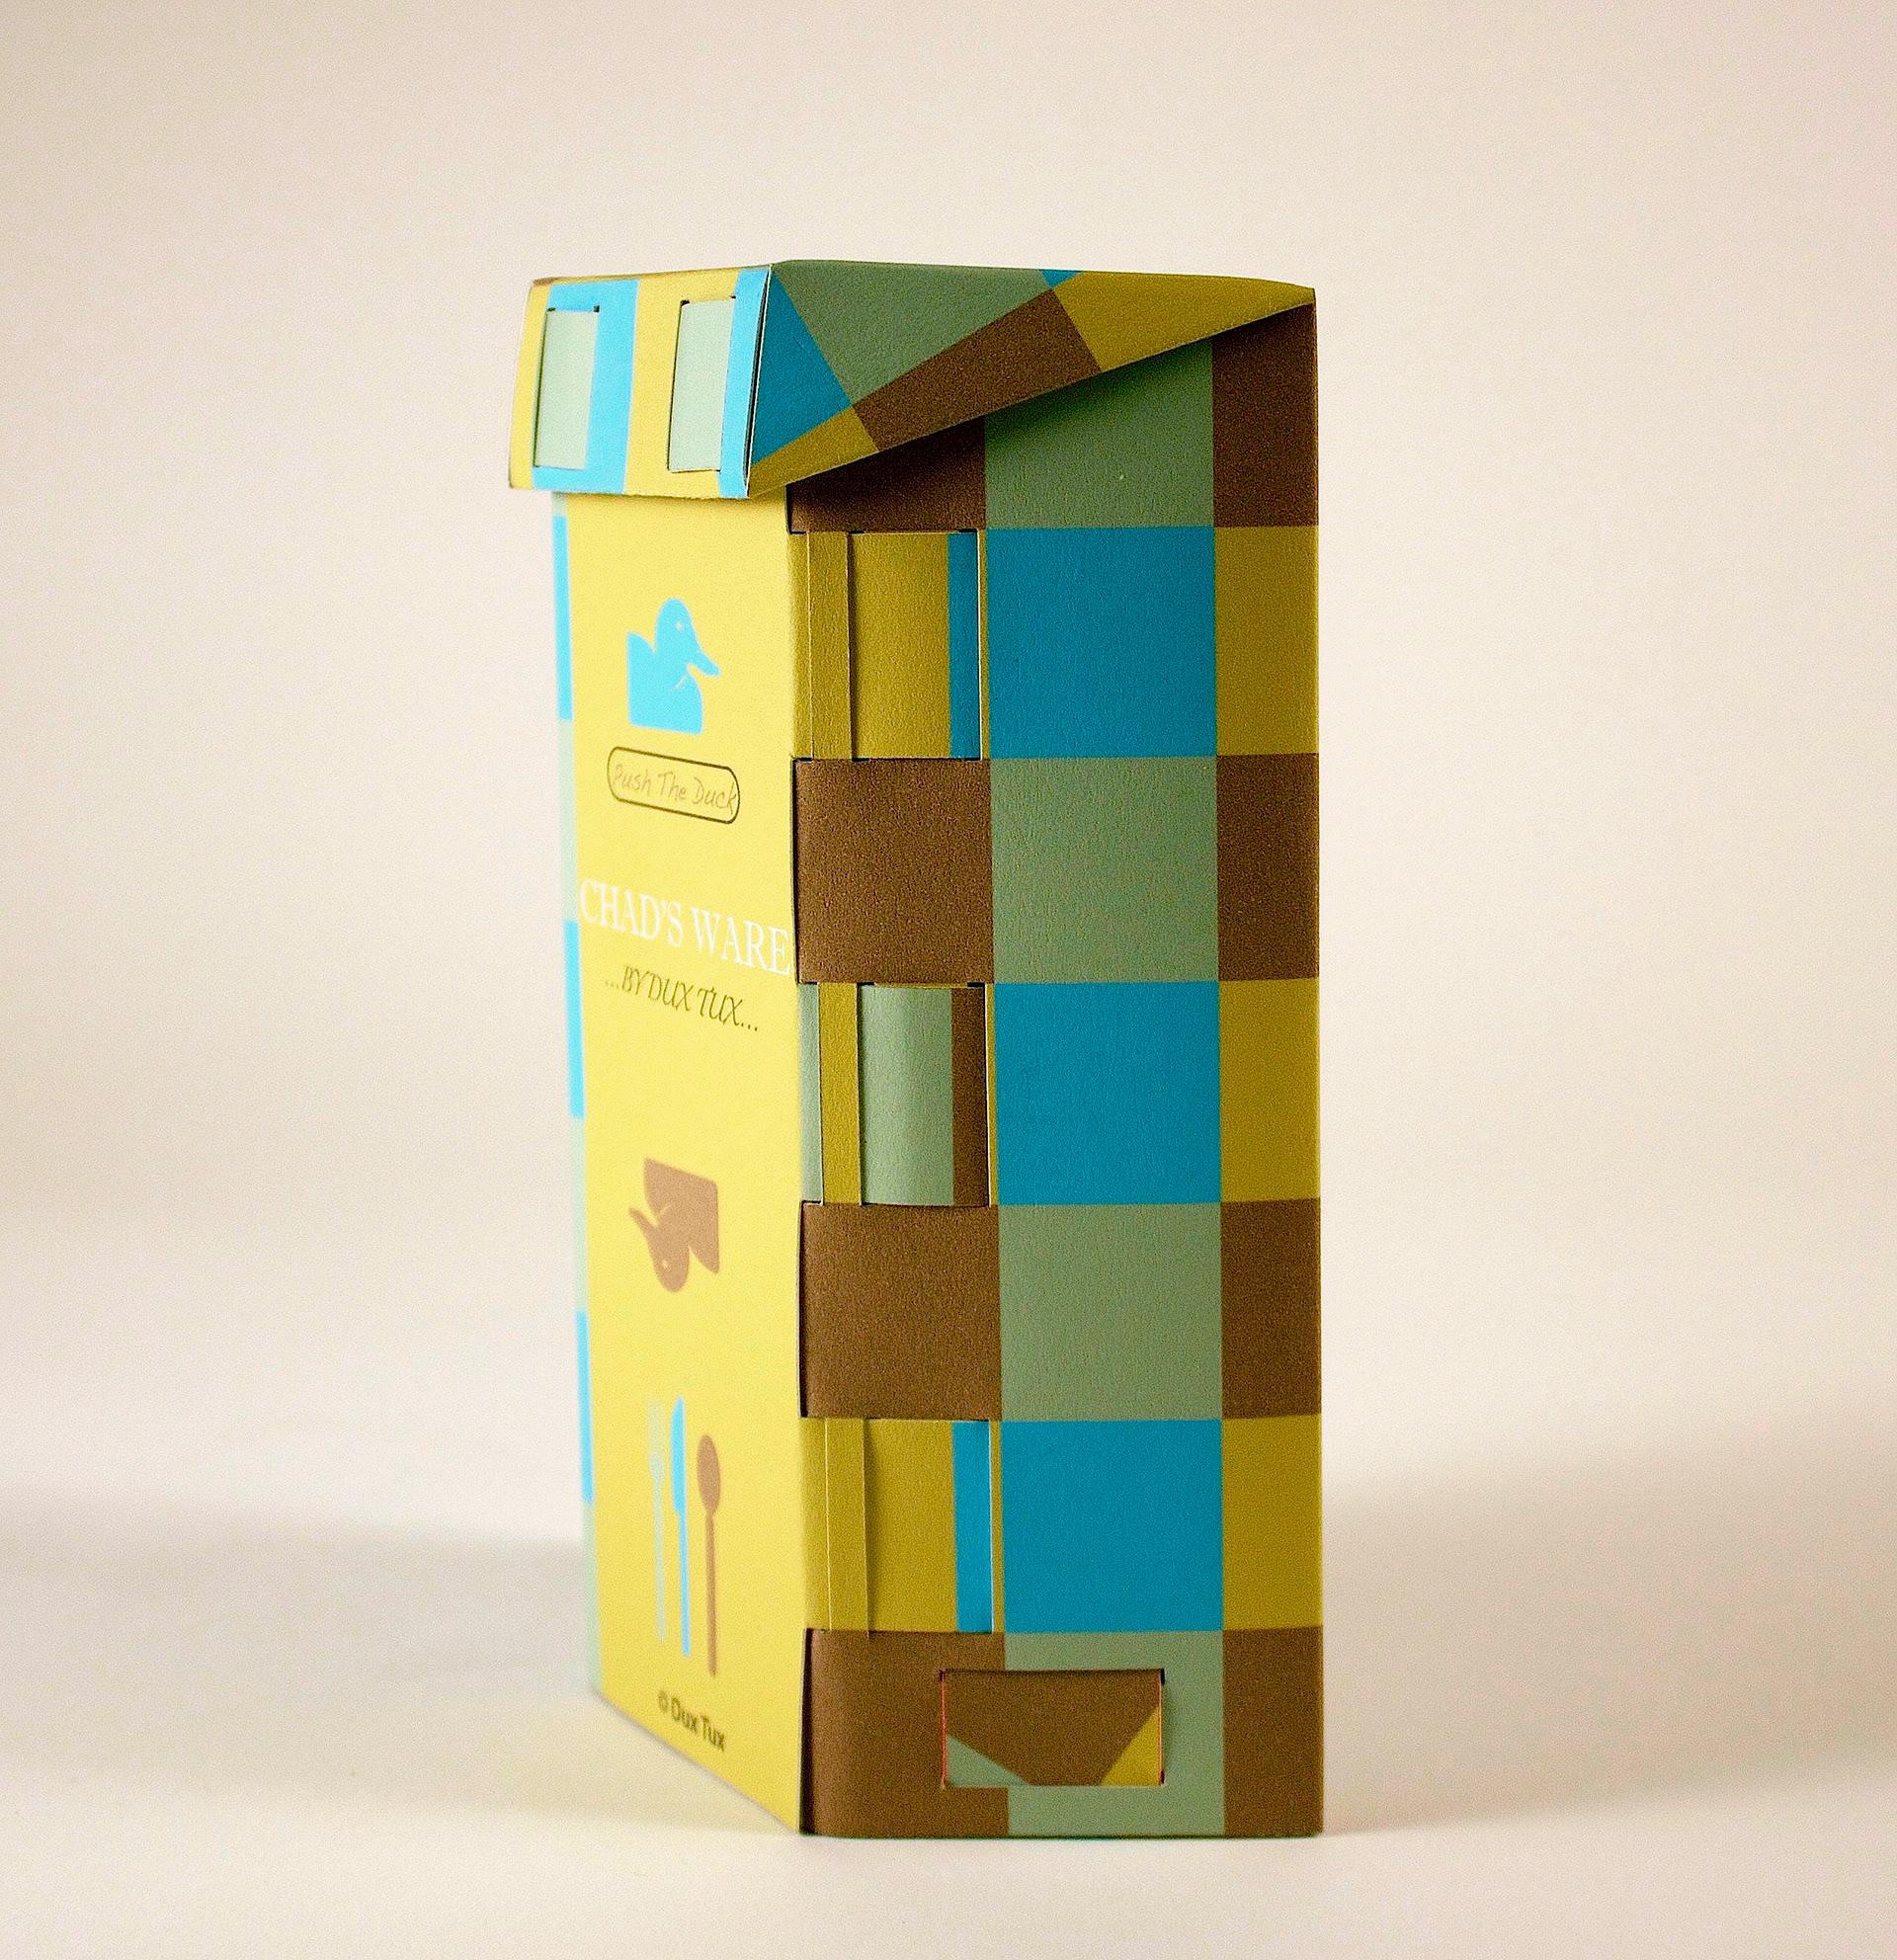 nick richardson silverware container